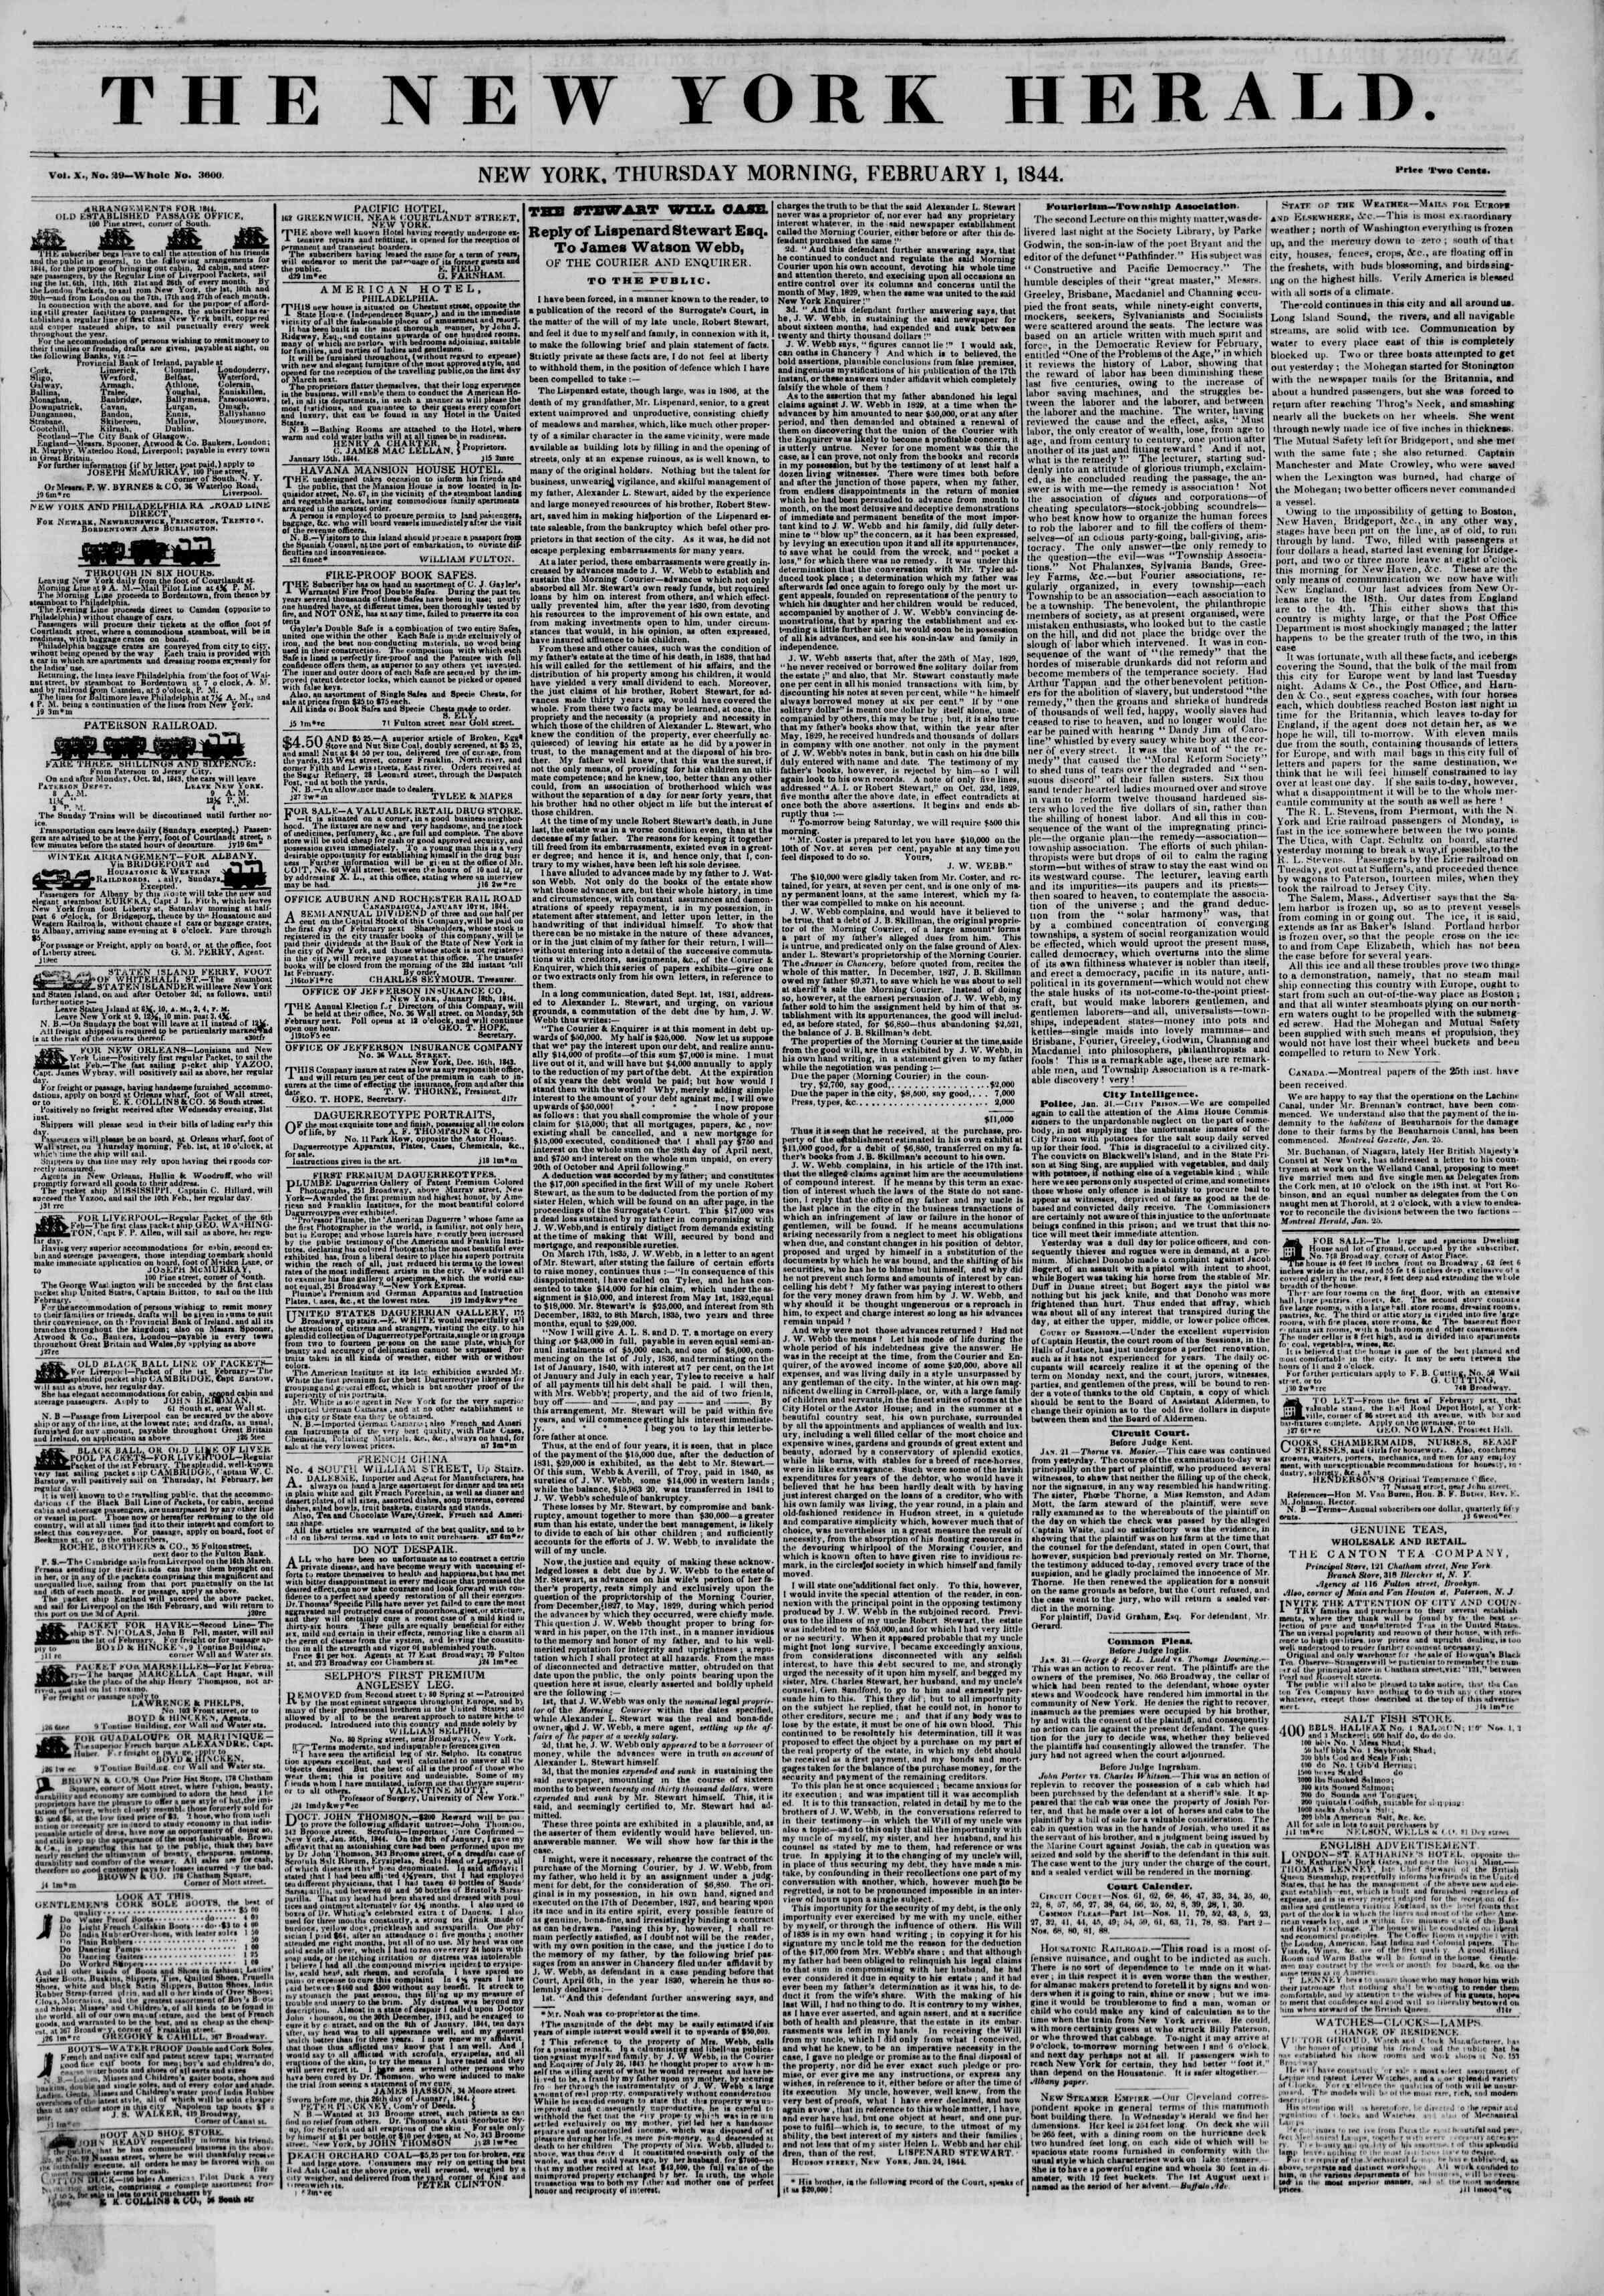 February 1, 1844 Tarihli The New York Herald Gazetesi Sayfa 1